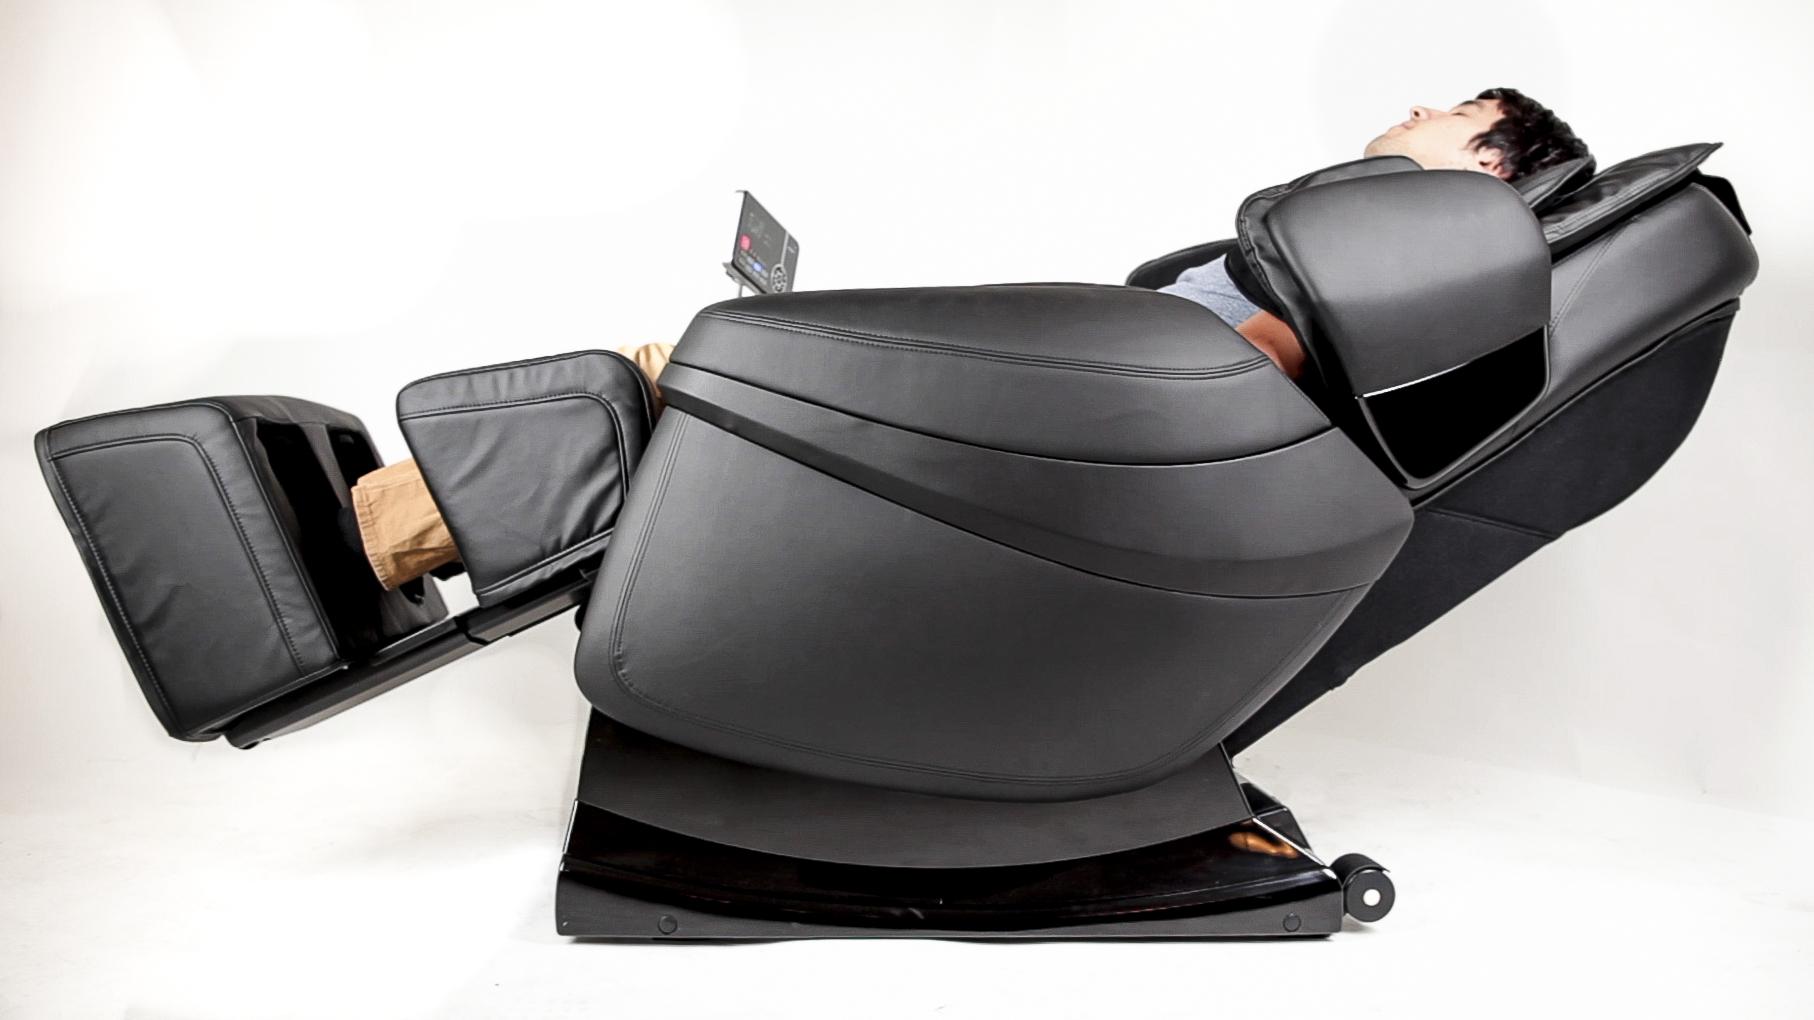 Full Body Massage Chair Atlanta GA